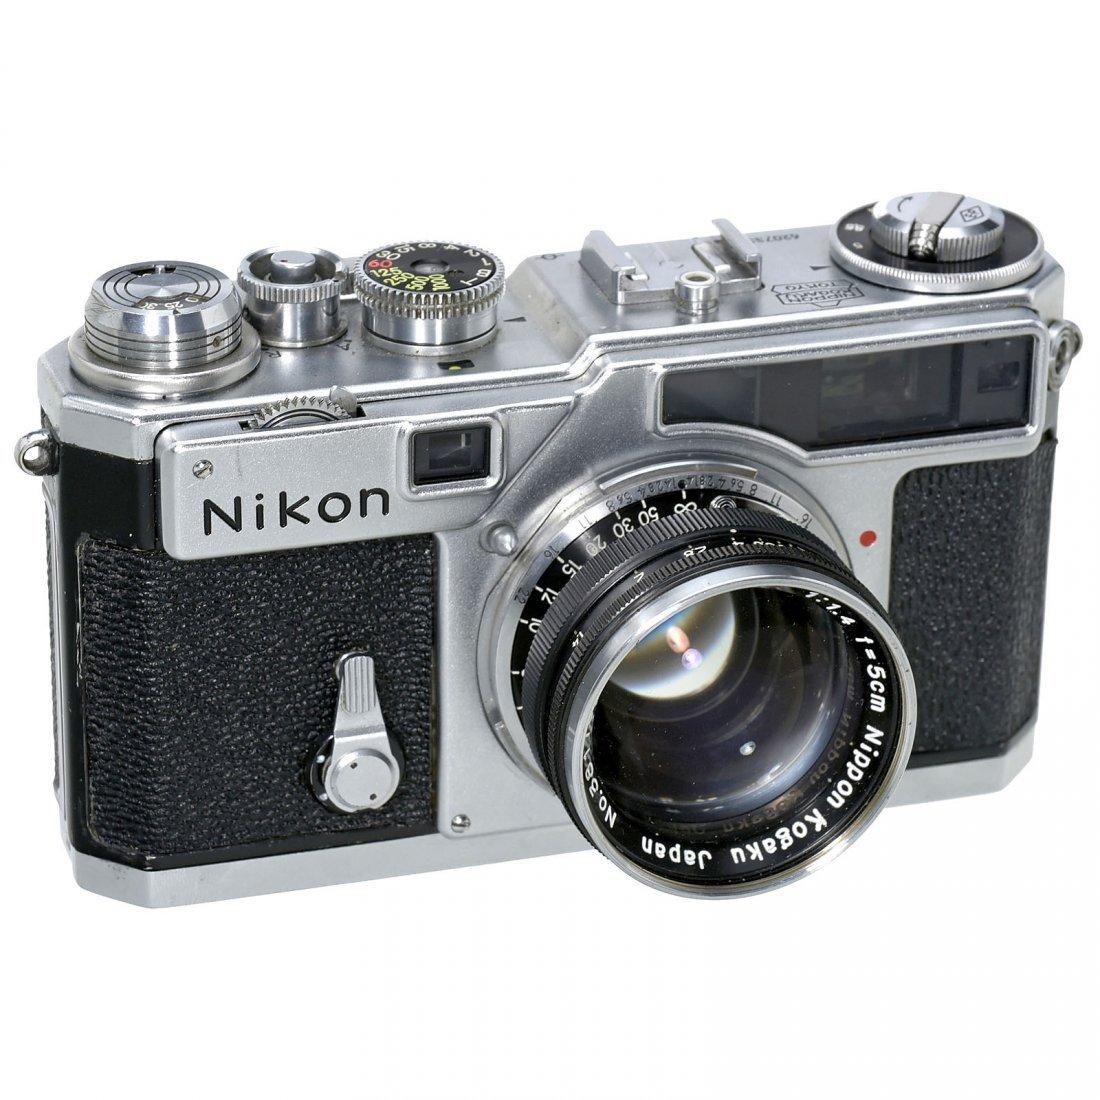 Nikon SP (Chrome) with Nikkor 1,4/5 cm, c. 1957